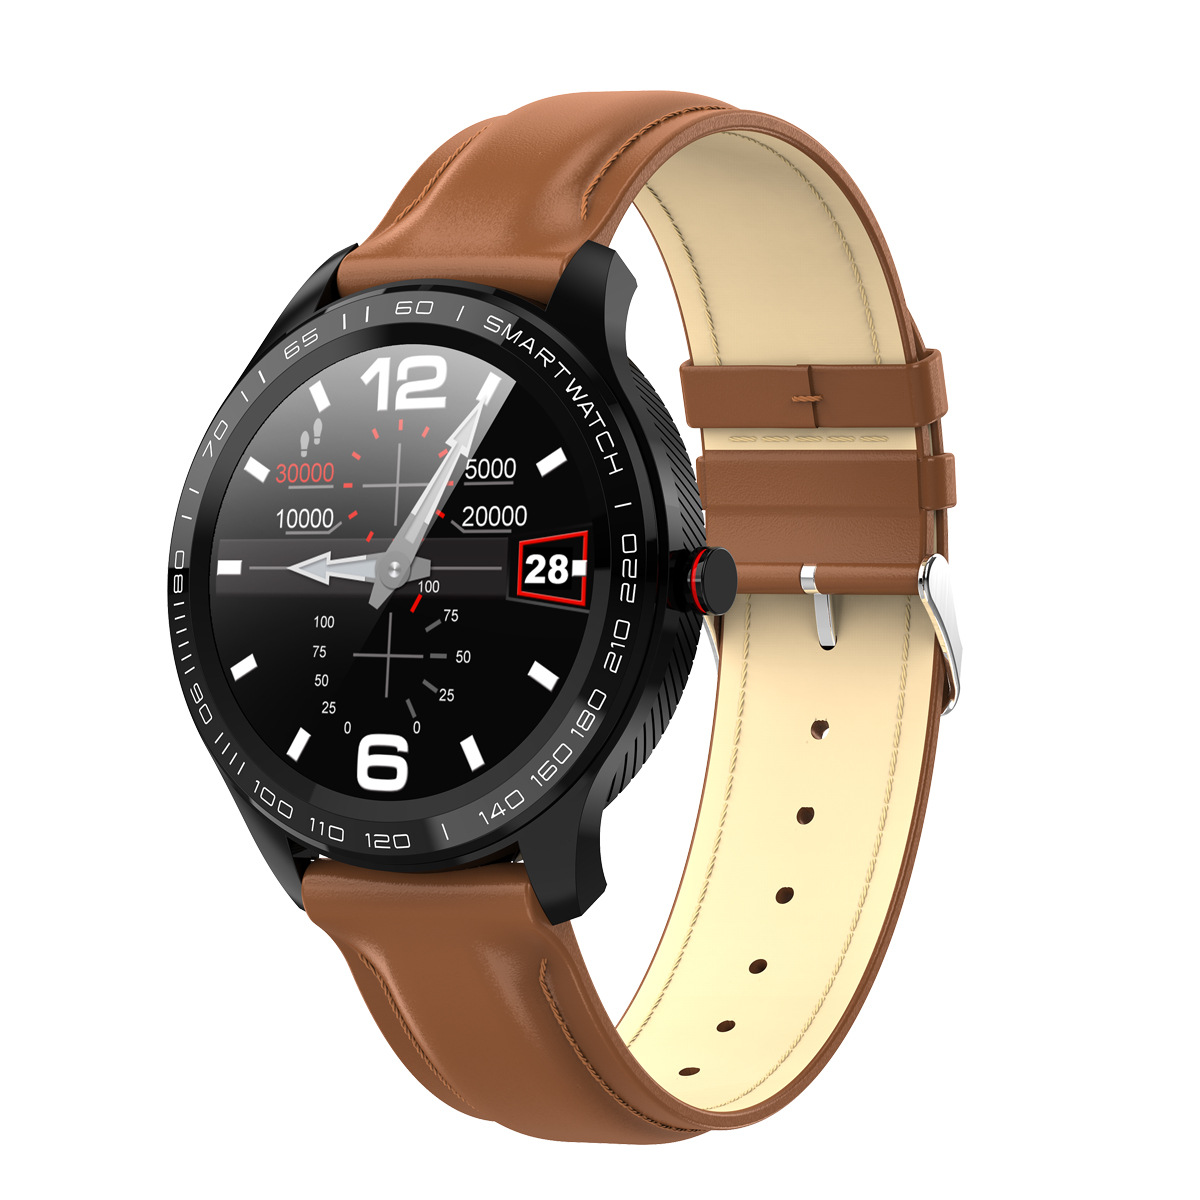 L9 Bracelet Full Round Screen Multi-Sport Heart Rate Sleep Monitoring Offline Payment Bracelet Brown leather belt